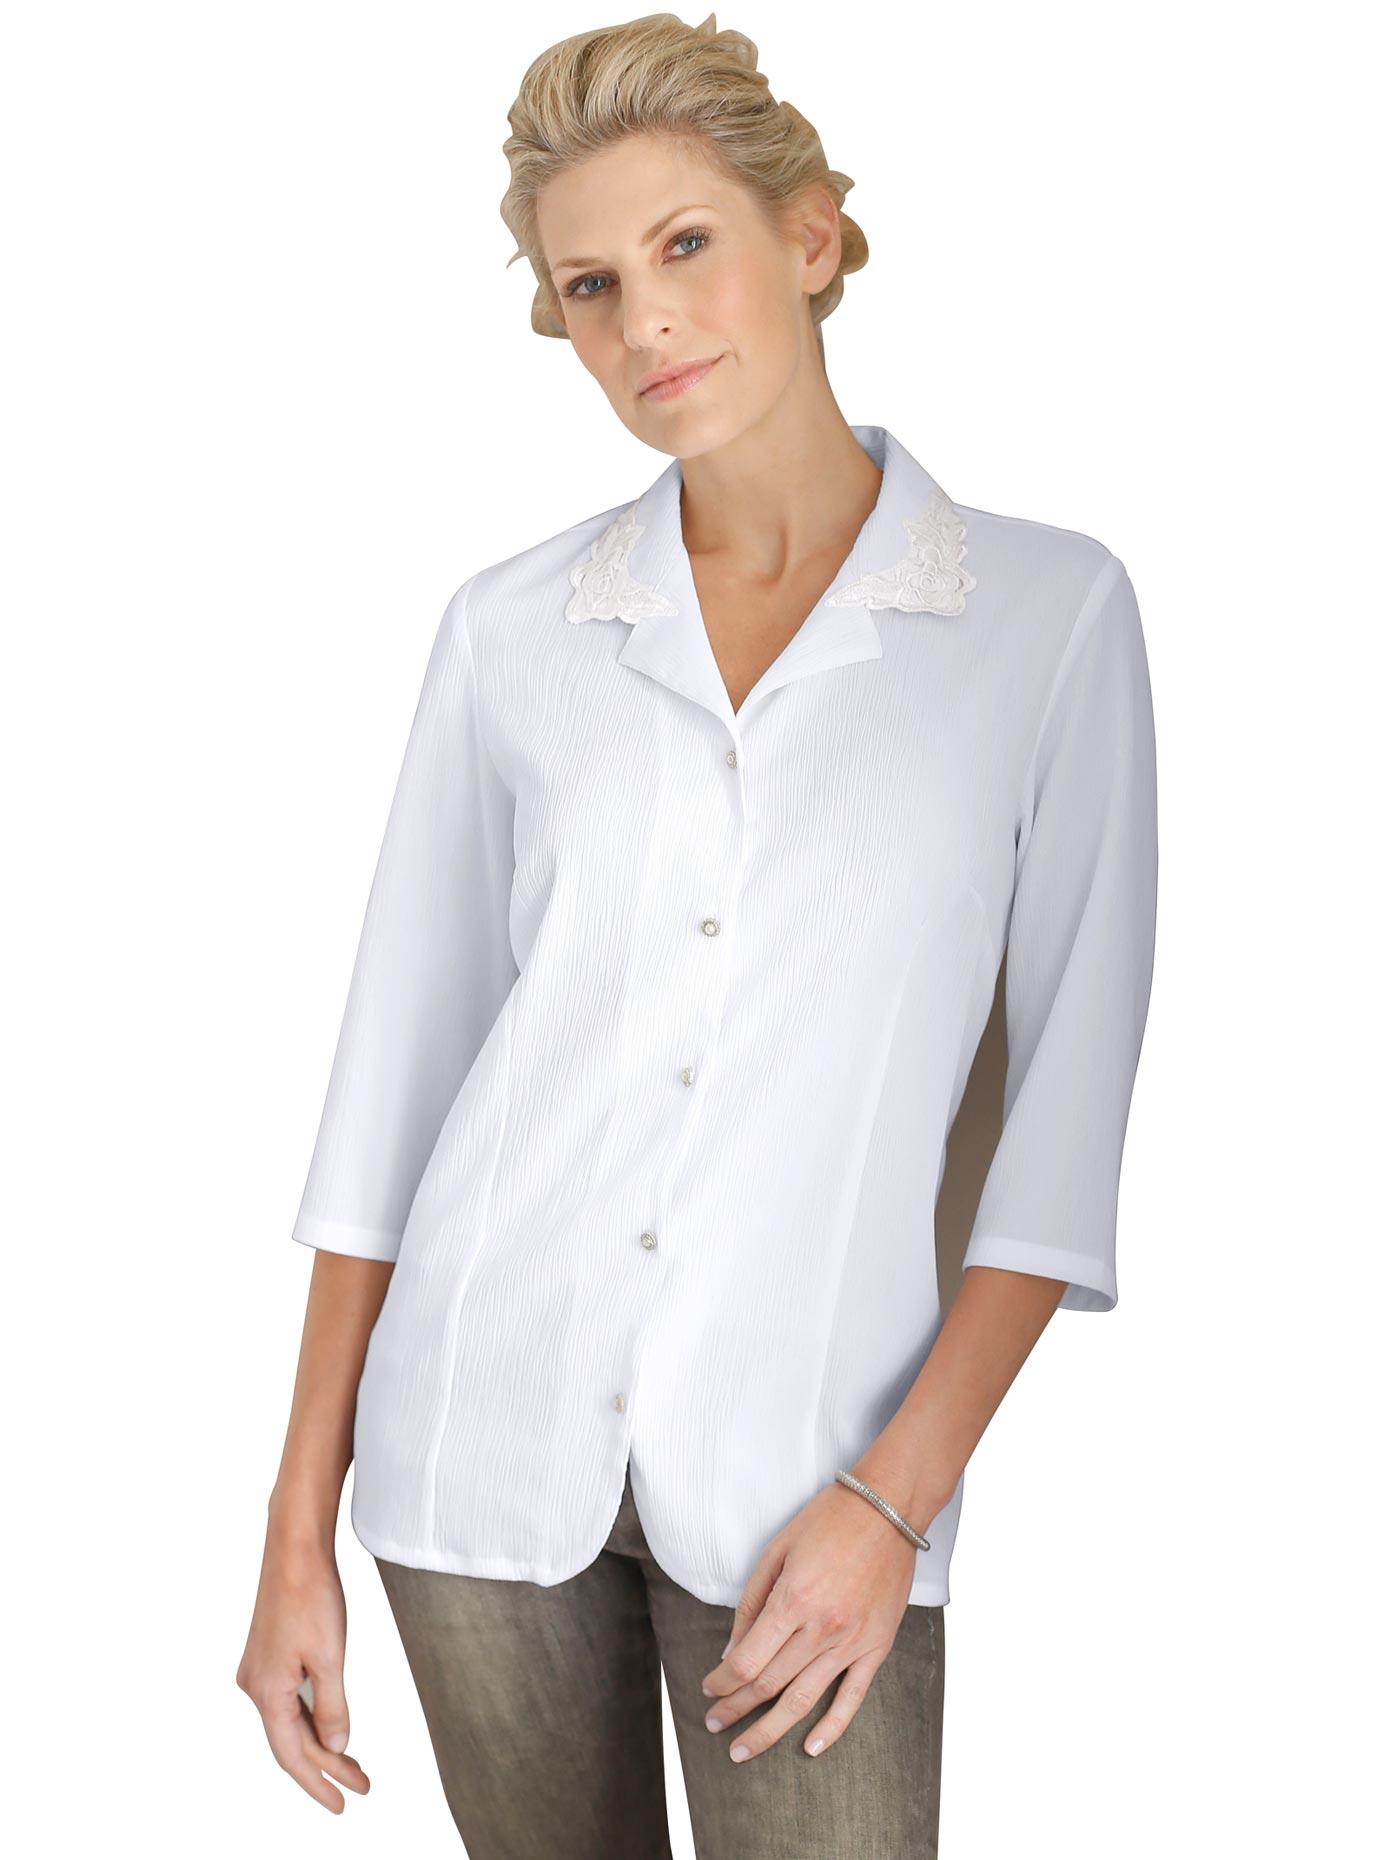 Image of Classic Basics Bluse in bügelleichter Crinkle-Qualität